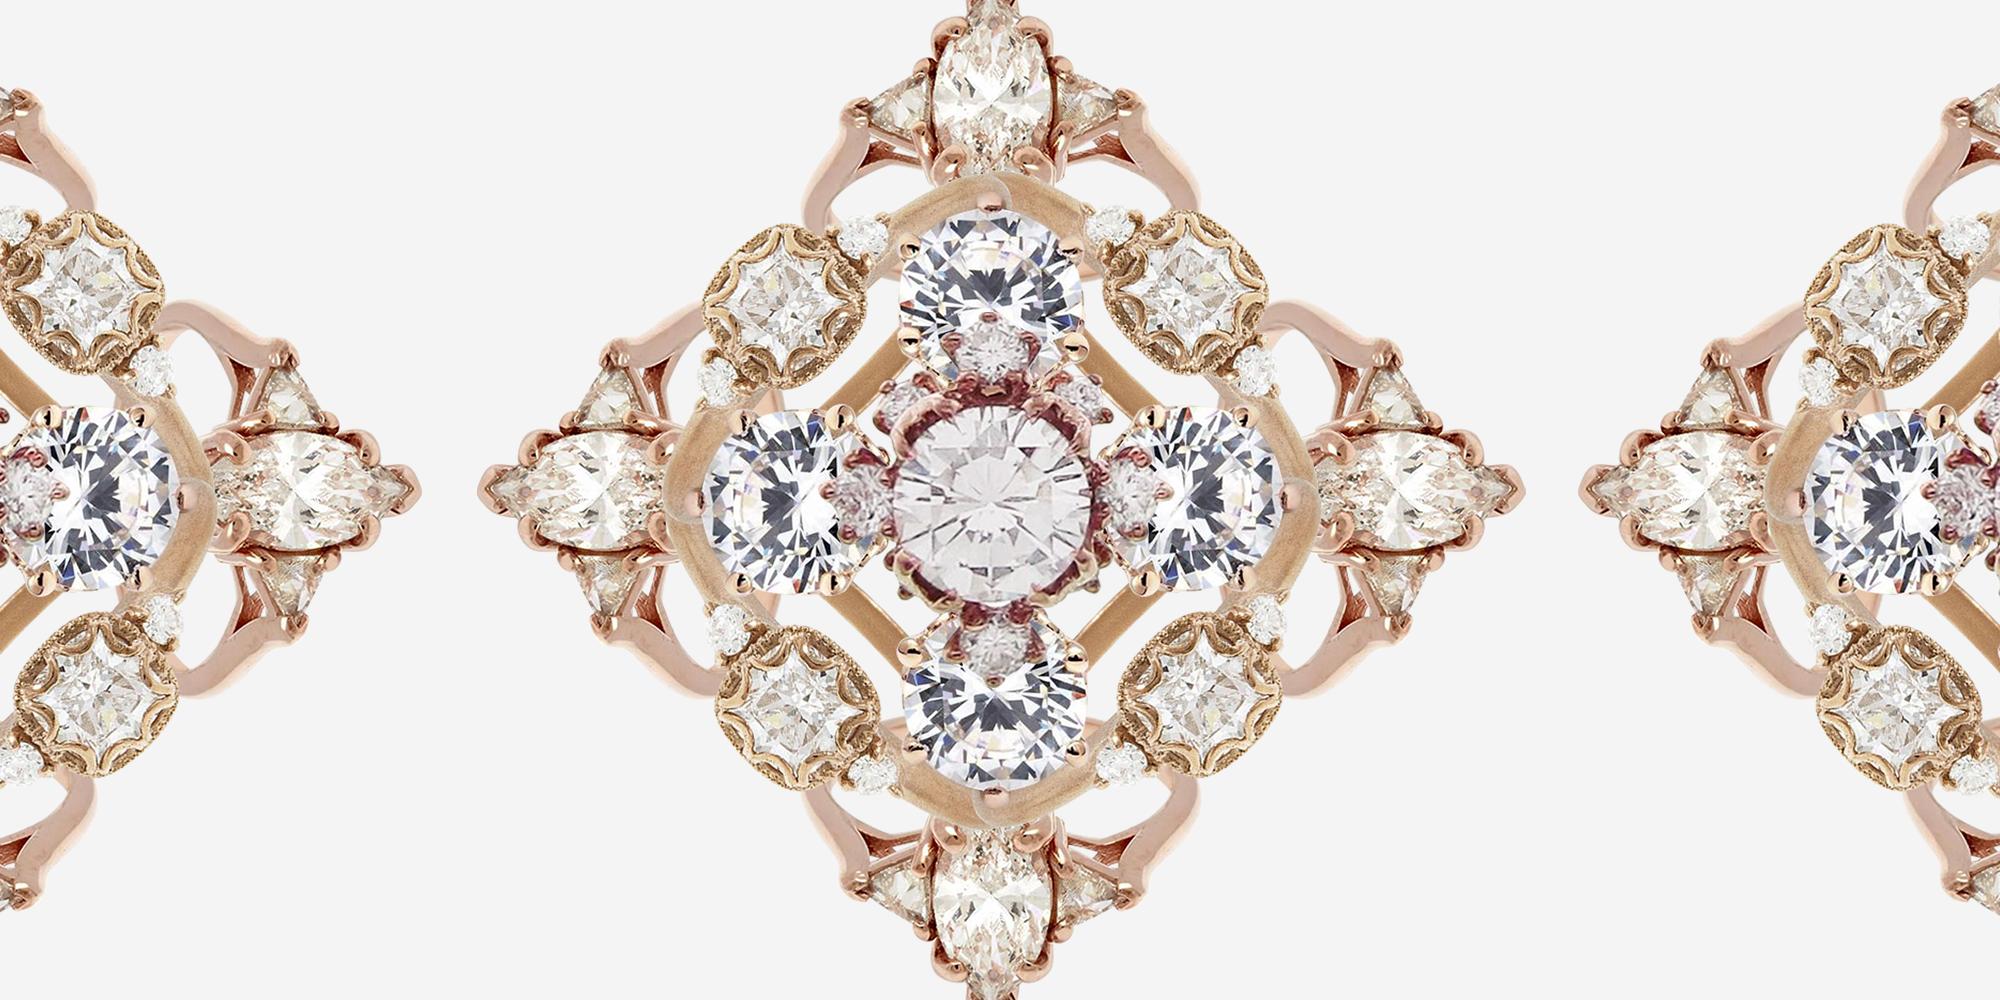 45 Best Rose Gold Engagement Rings Stunning Rose Gold Engagement Rings And Wedding Bands